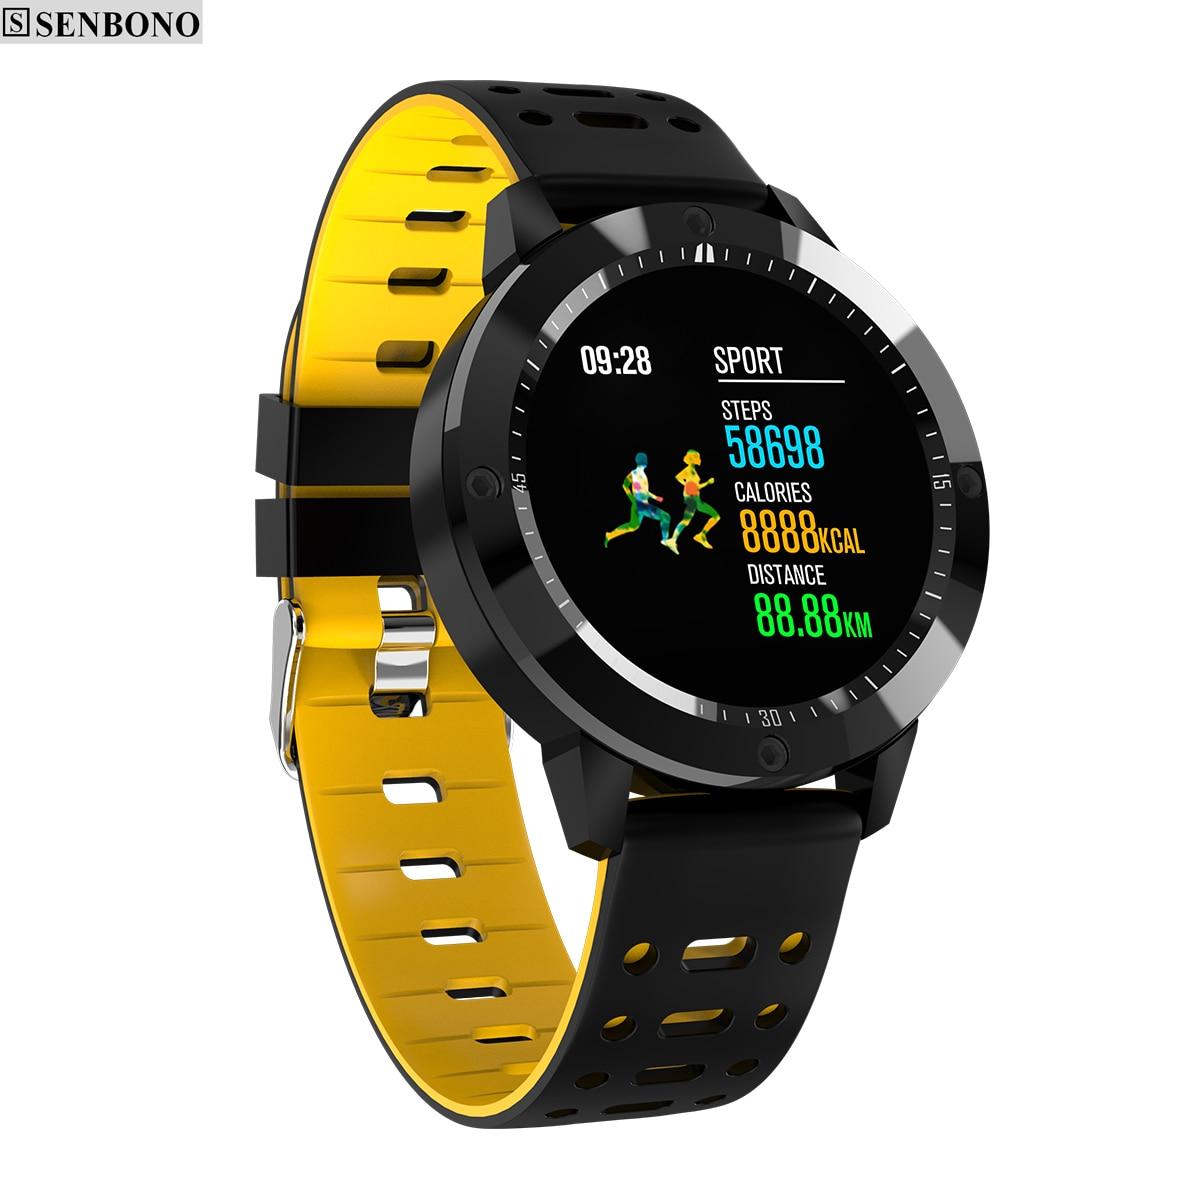 Watches New Smart Watch Men Ip67 Waterproof Tempered Glass Activity Fitness Tracker Heart Rate Monitor Sports Men Women Smartwatch Cf58 Digital Watches